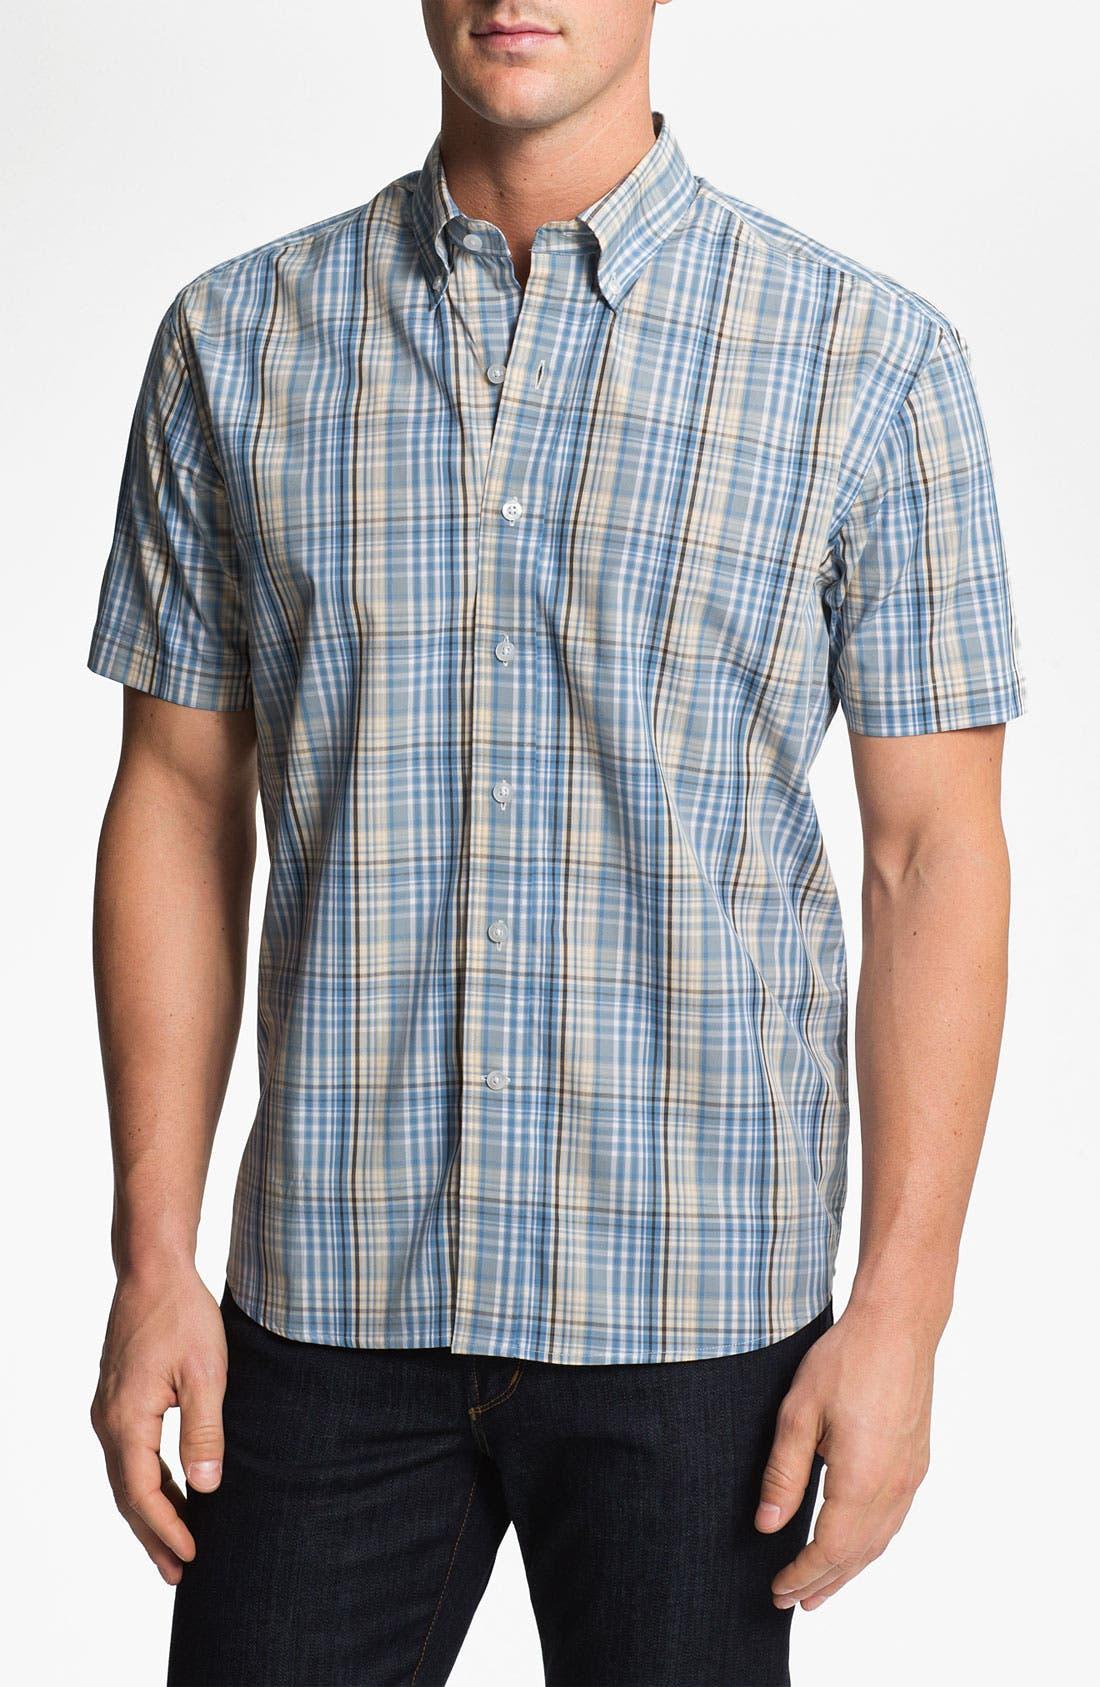 Main Image - Cutter & Buck 'Leary' Plaid Sport Shirt (Big & Tall)